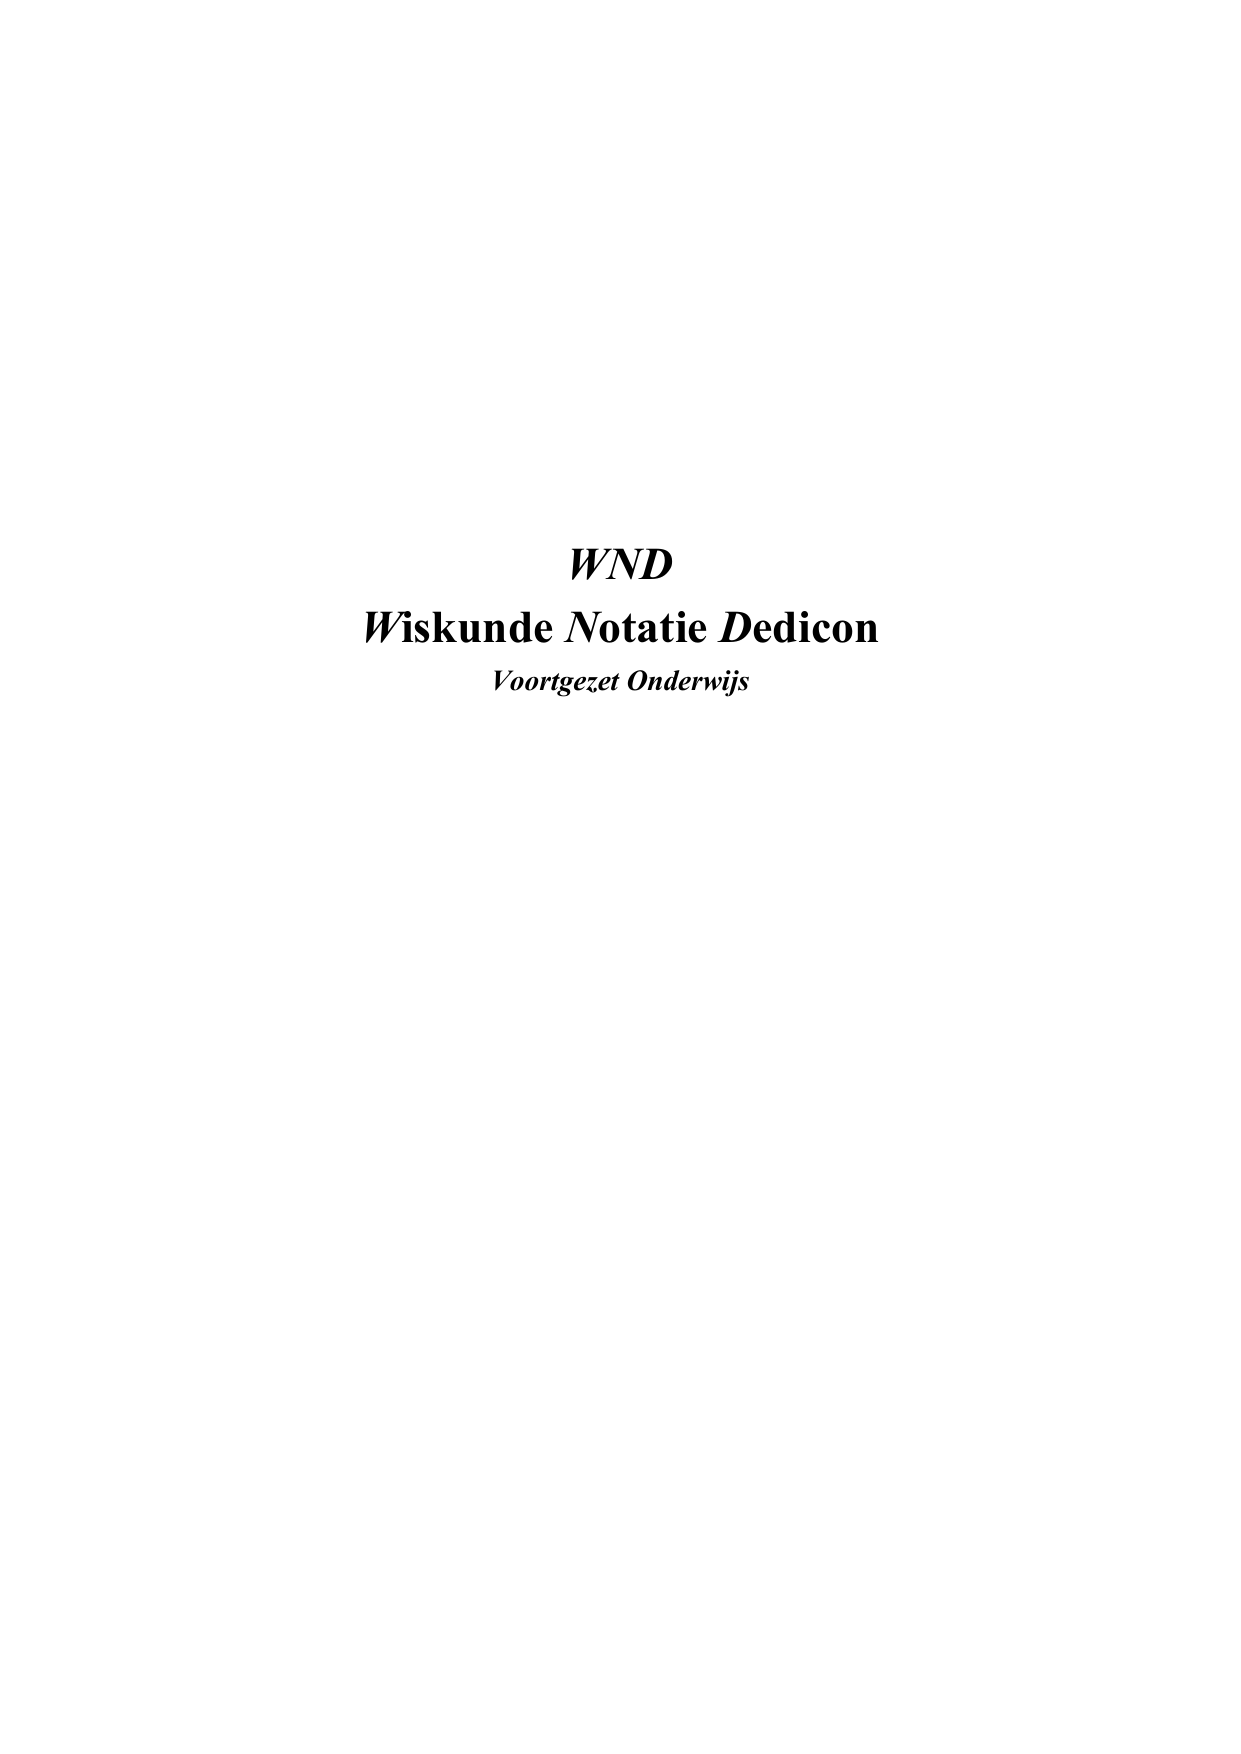 Wiskunde Notatie Dedicon